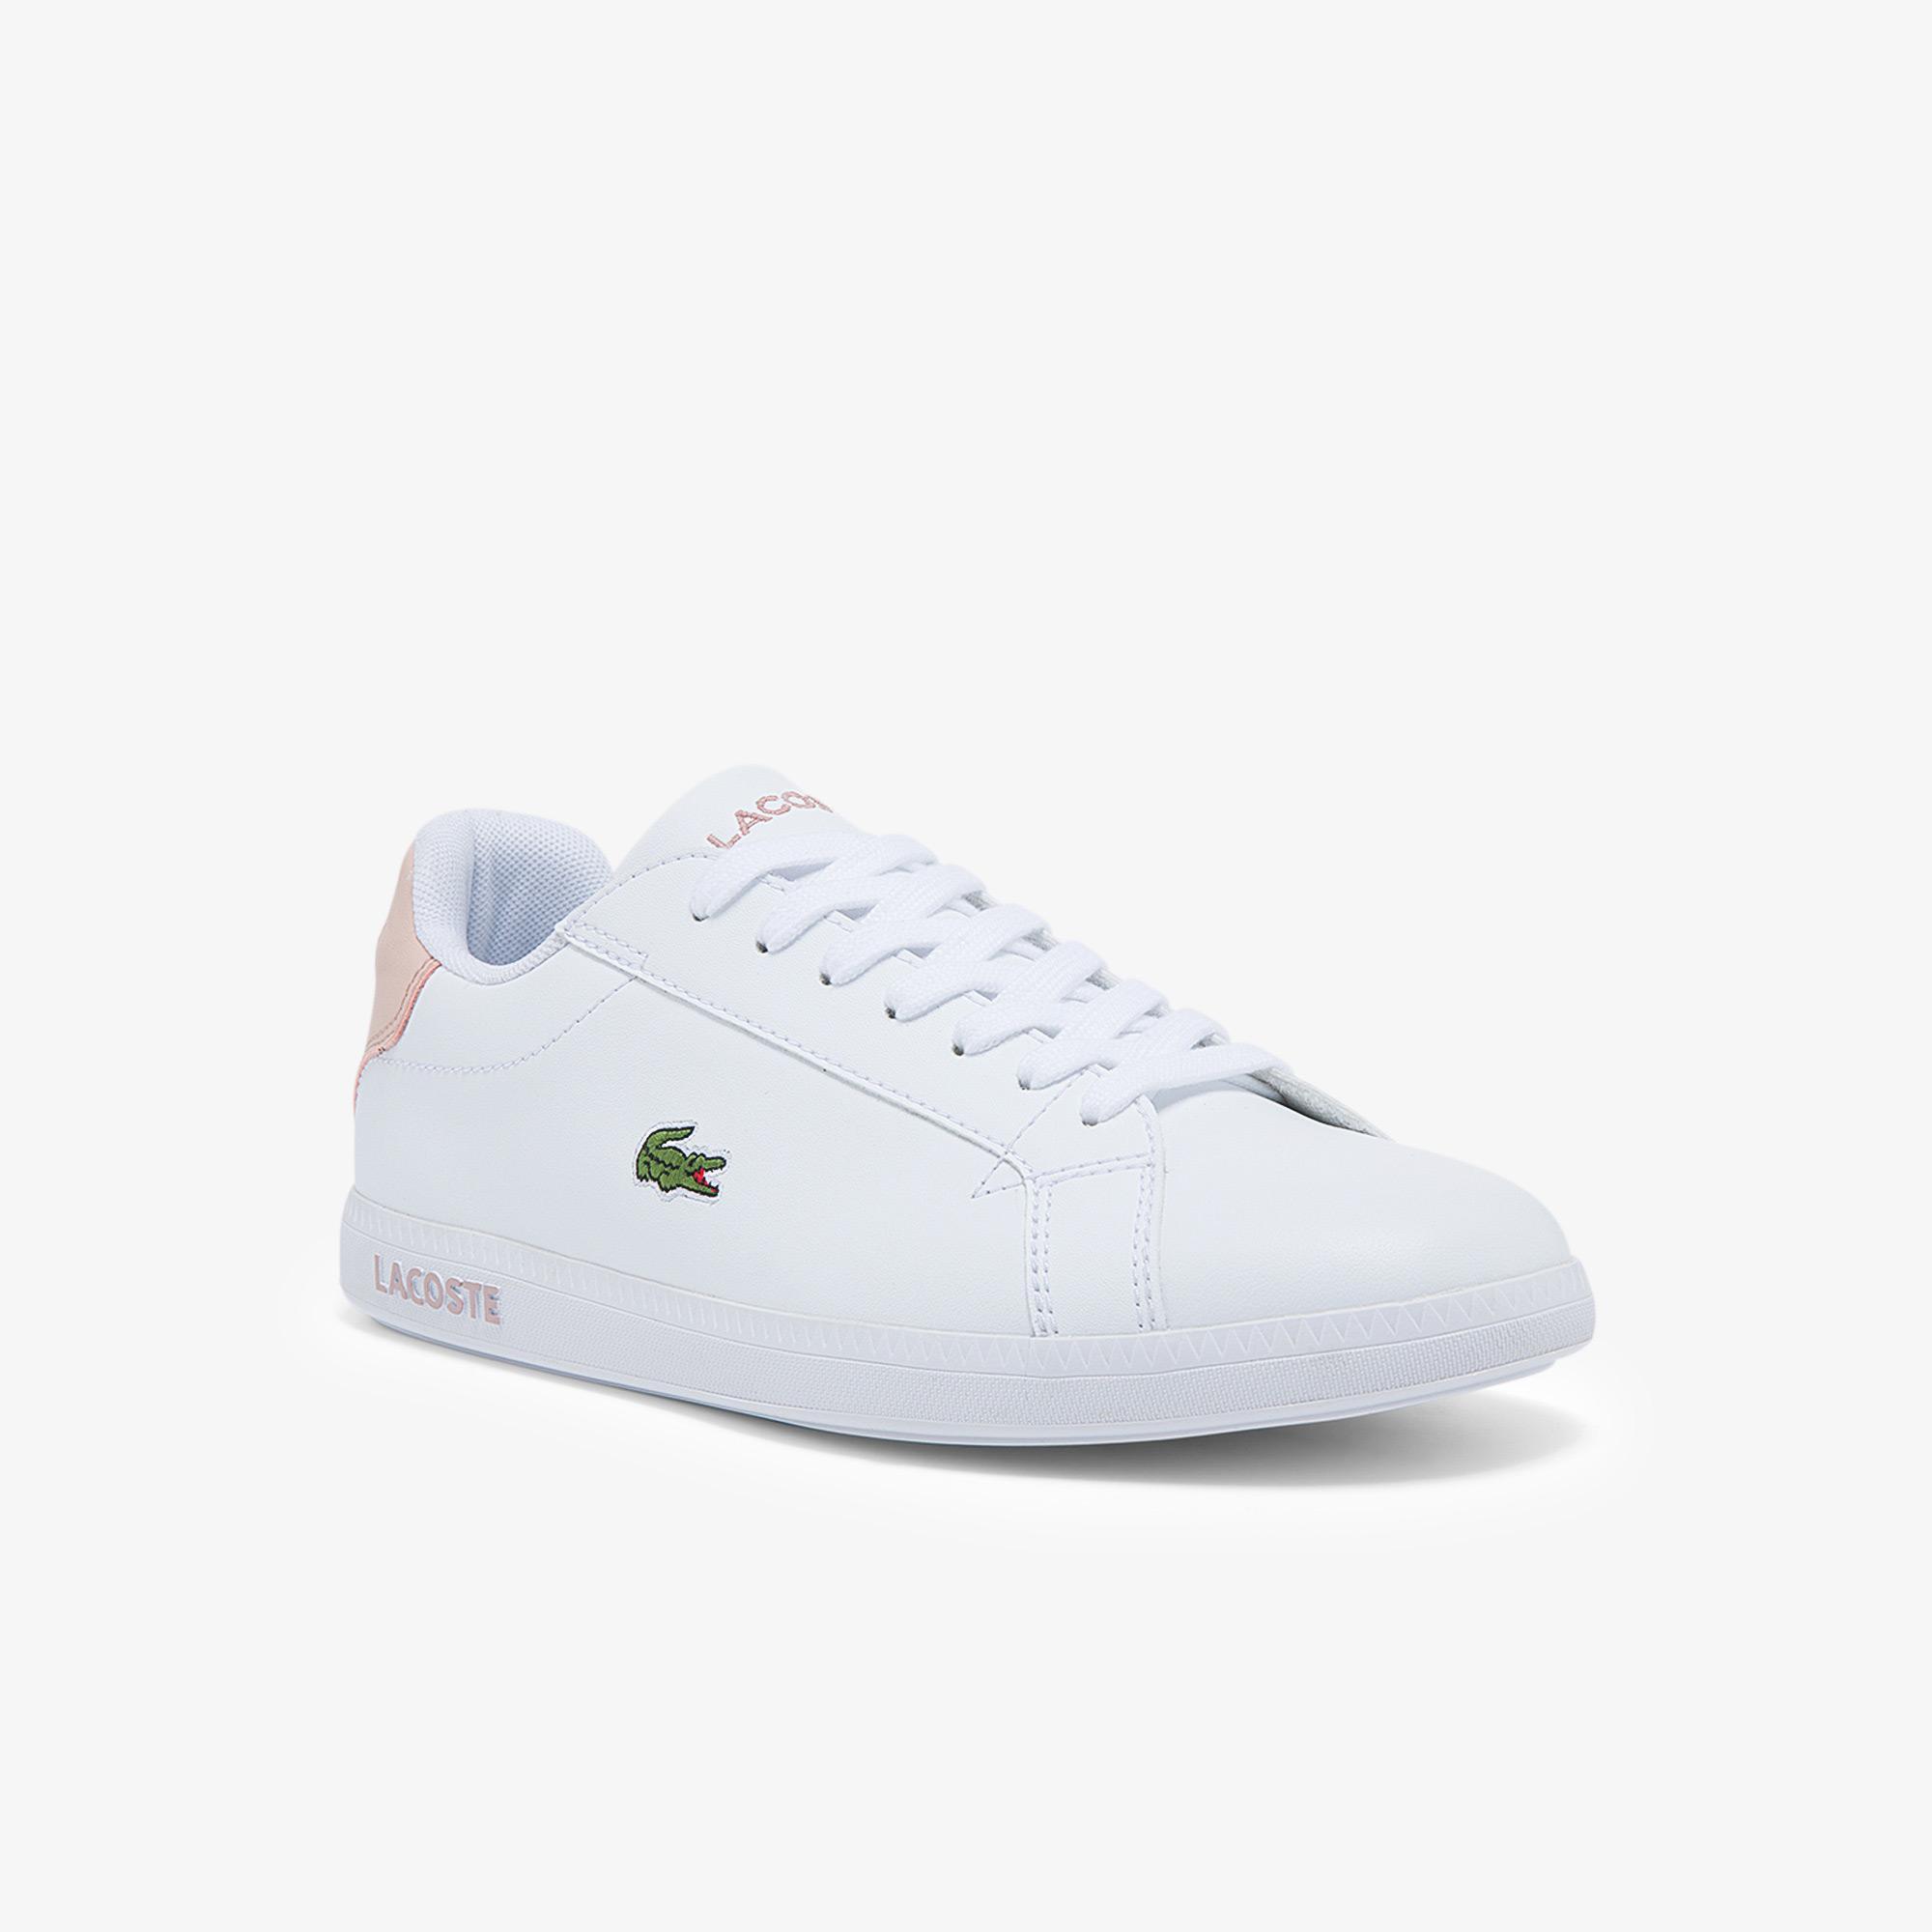 Lacoste Graduate Bl 21 1 Sfa Kadın Beyaz - Açık Pembe Sneaker